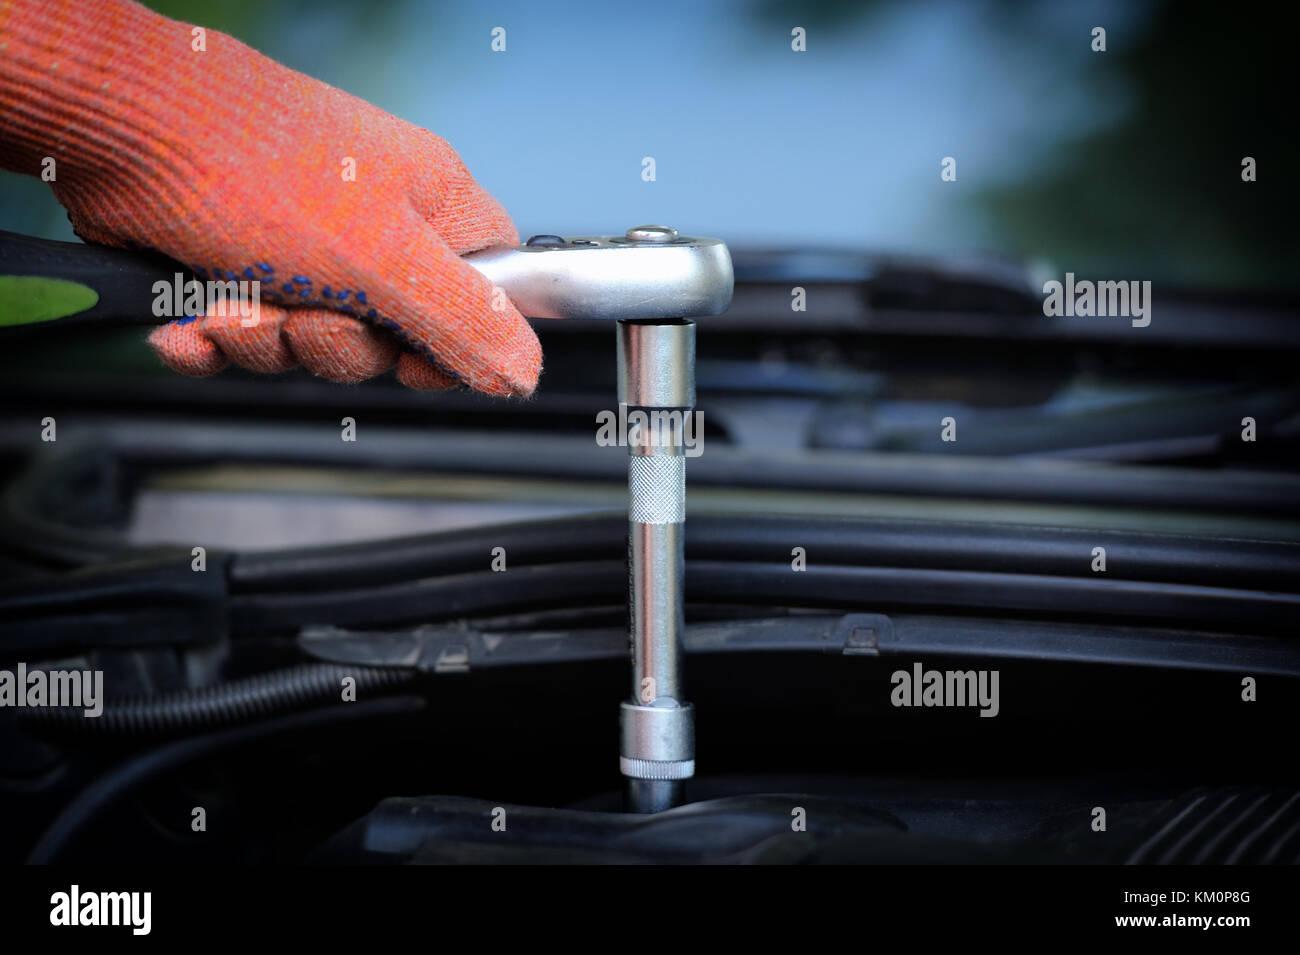 Hands of car mechanic in auto repair service - Stock Image